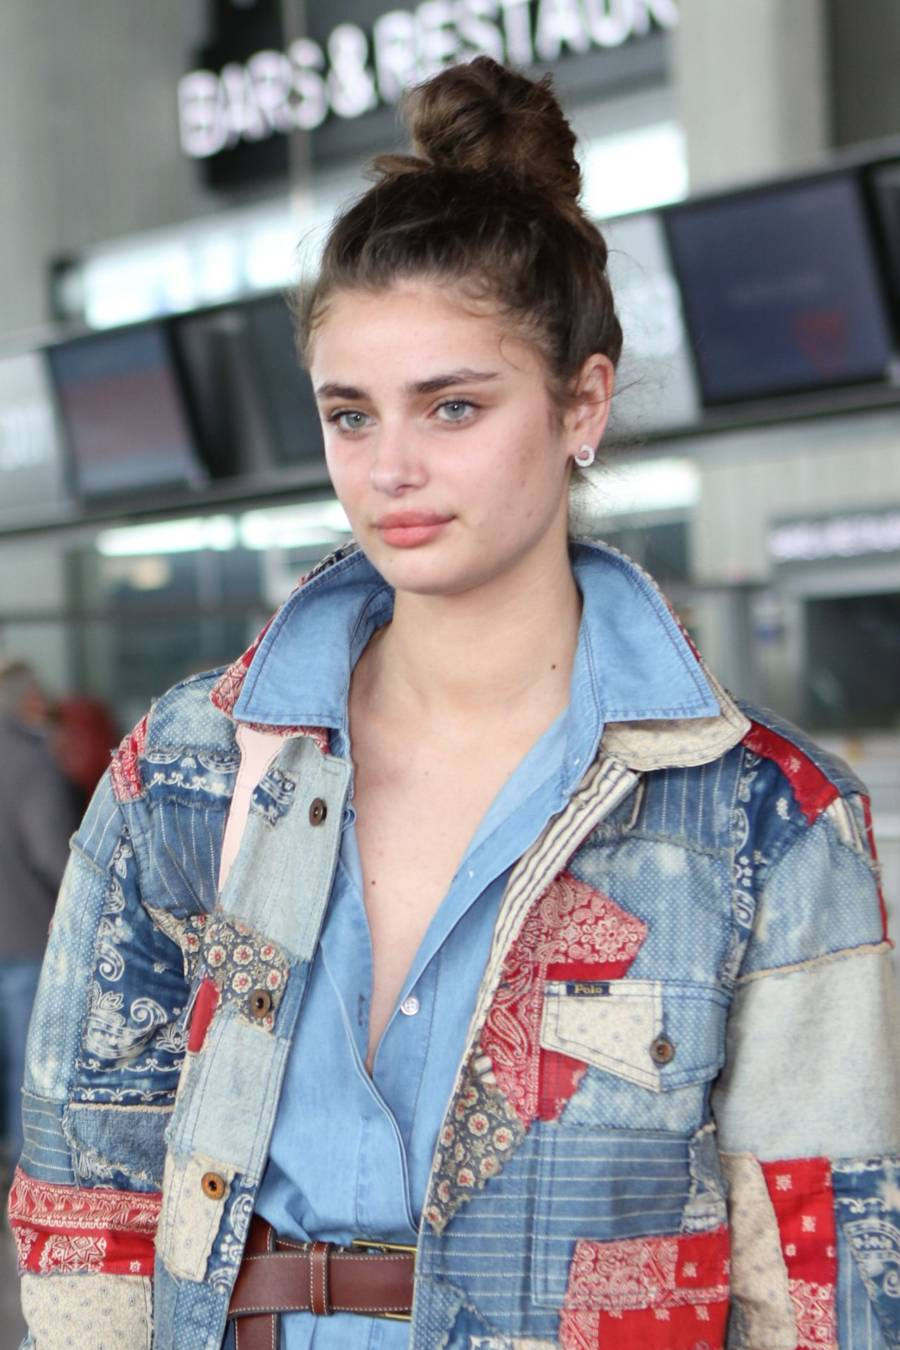 American Model Taylor Hill Hot Stills At Nice Airport